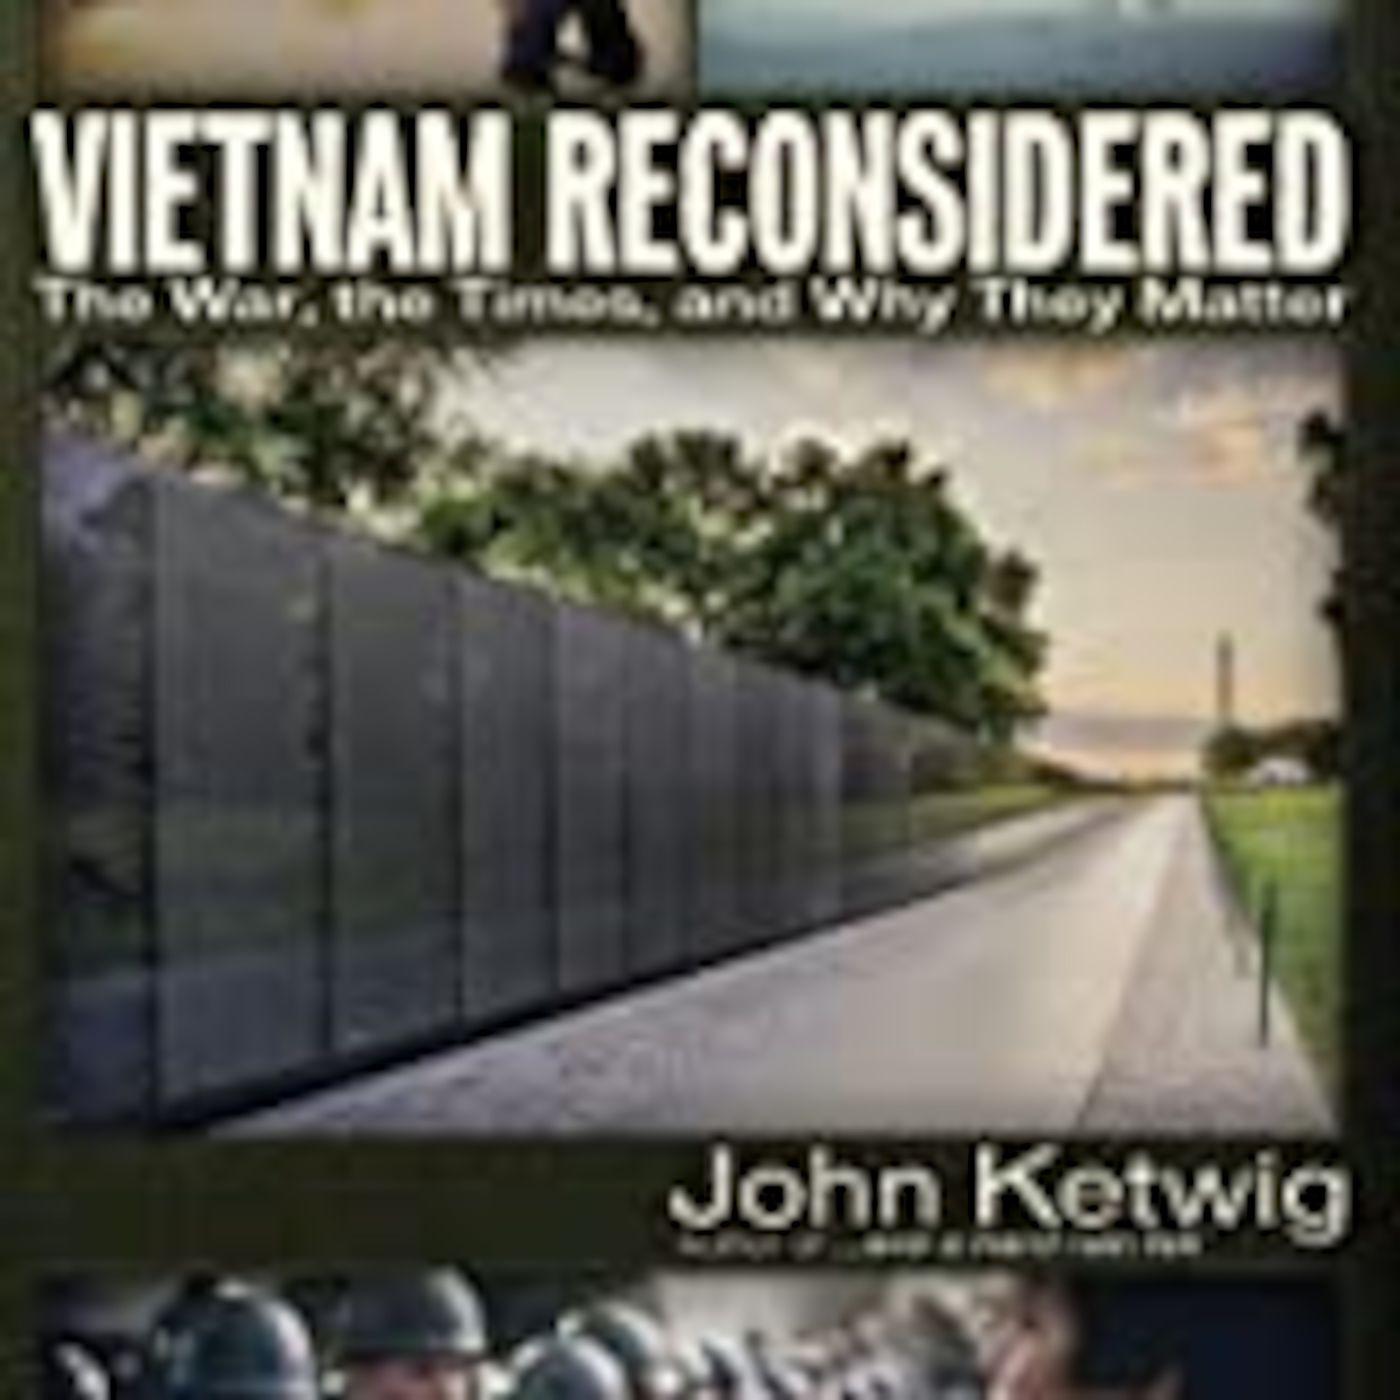 Vietnam Reconsidered